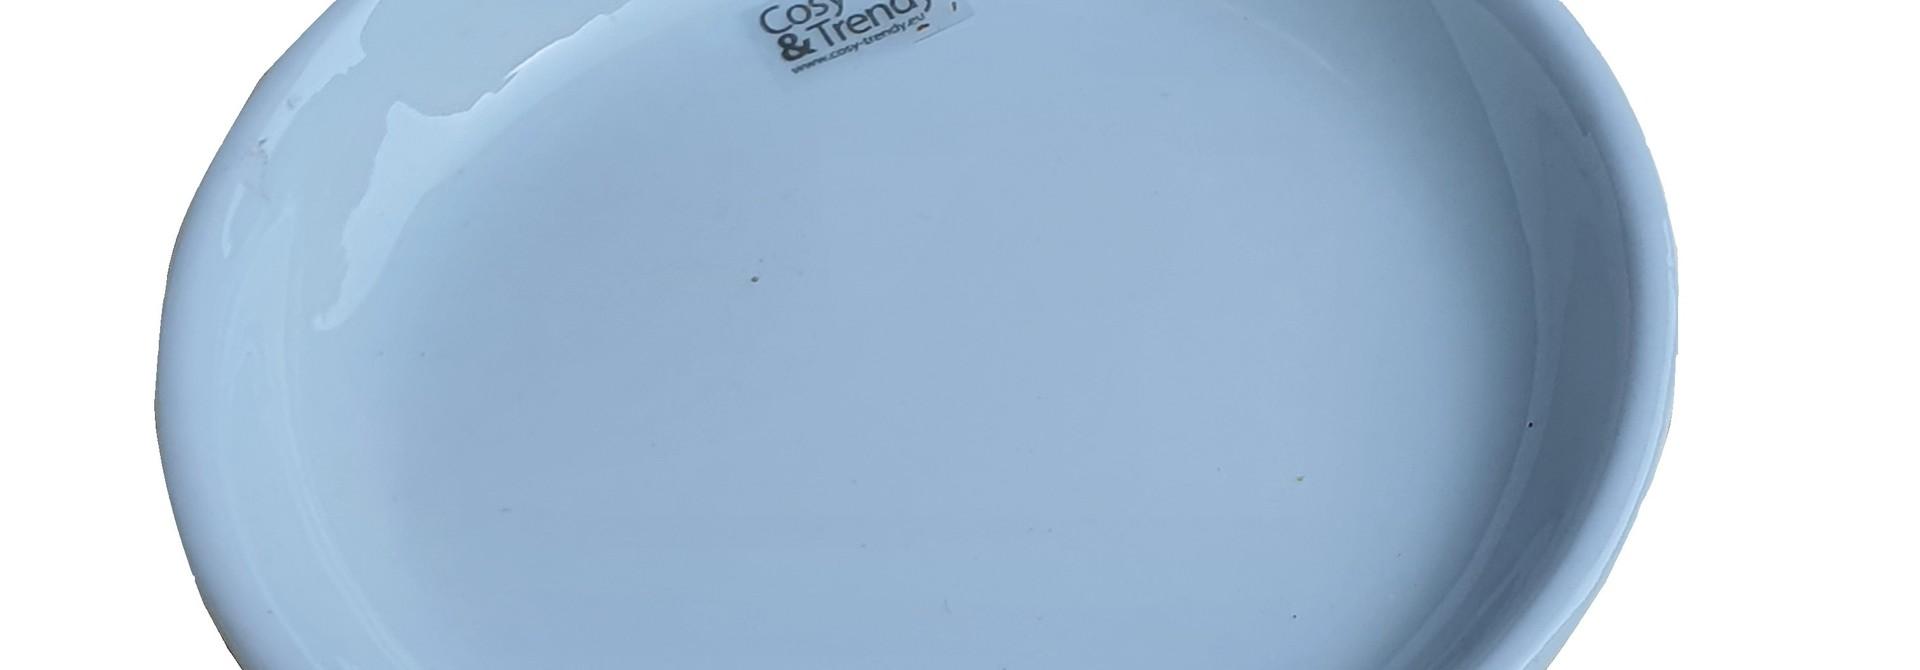 pot ceramic tapas plate white 15